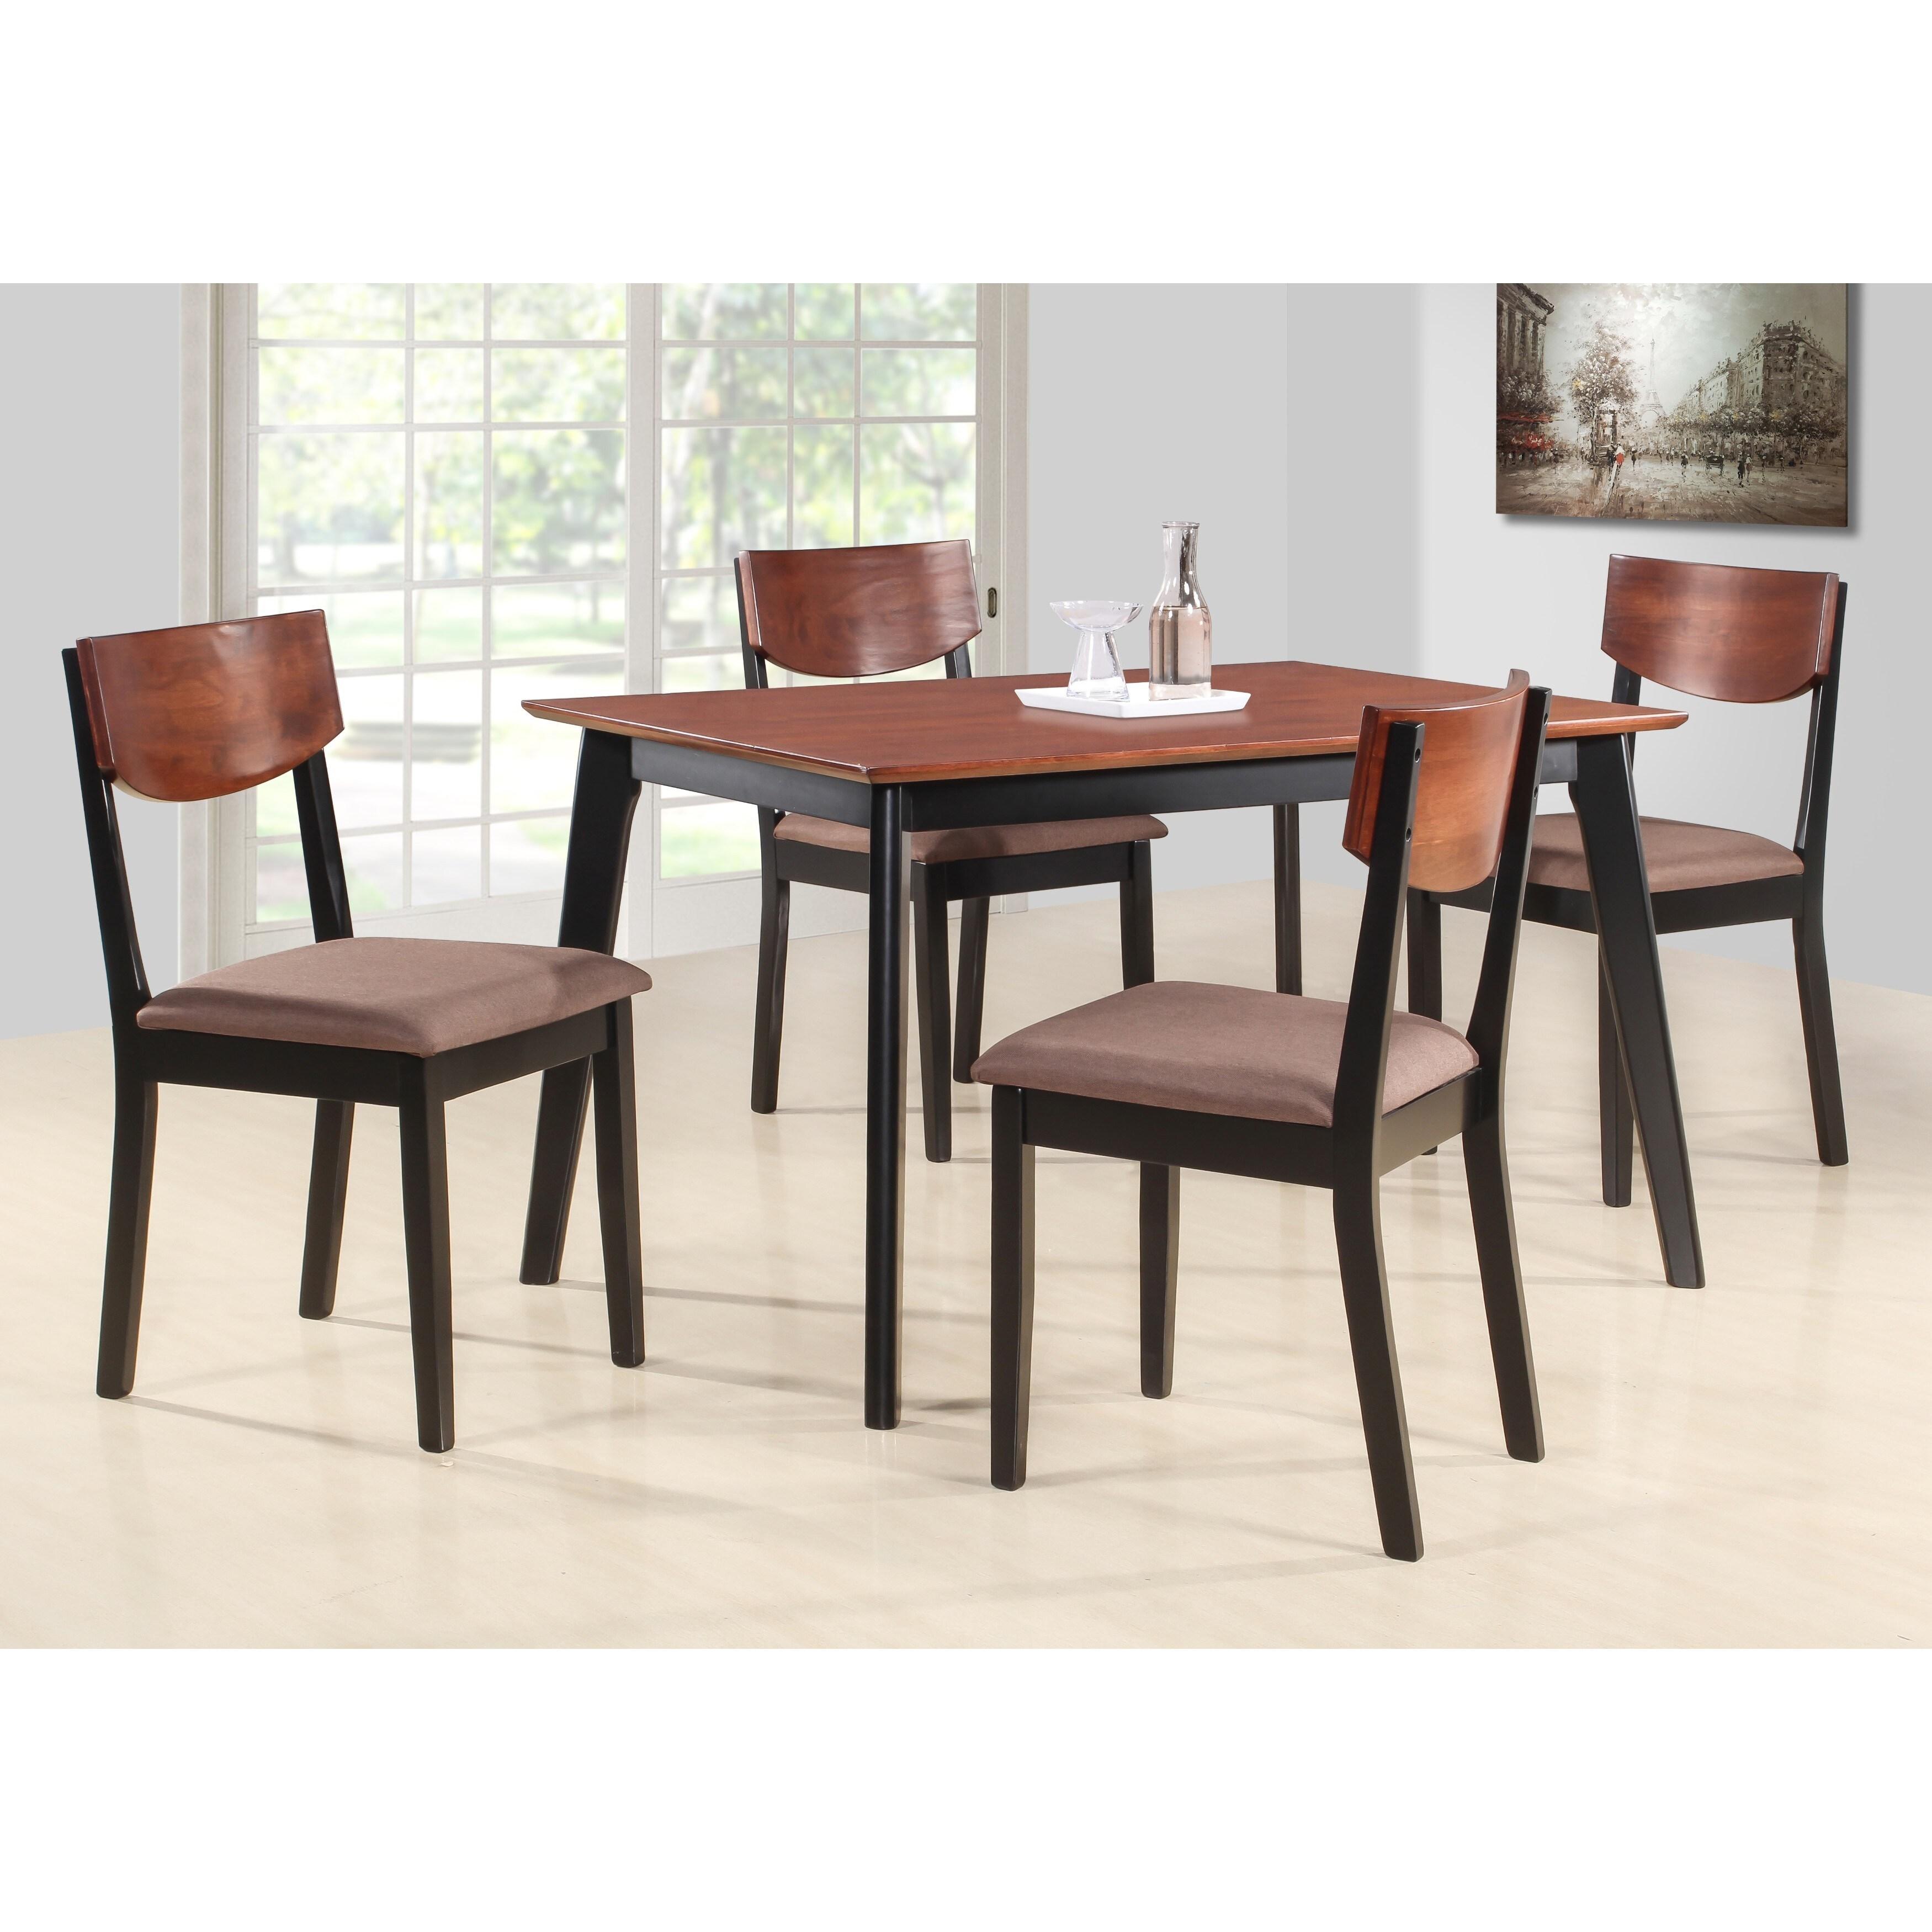 black wood rectangular dining table. Casey Walnut/ Black Wood Rectangle Kitchen Dinette Dining Table - Free Shipping Today Overstock 21527085 Rectangular I